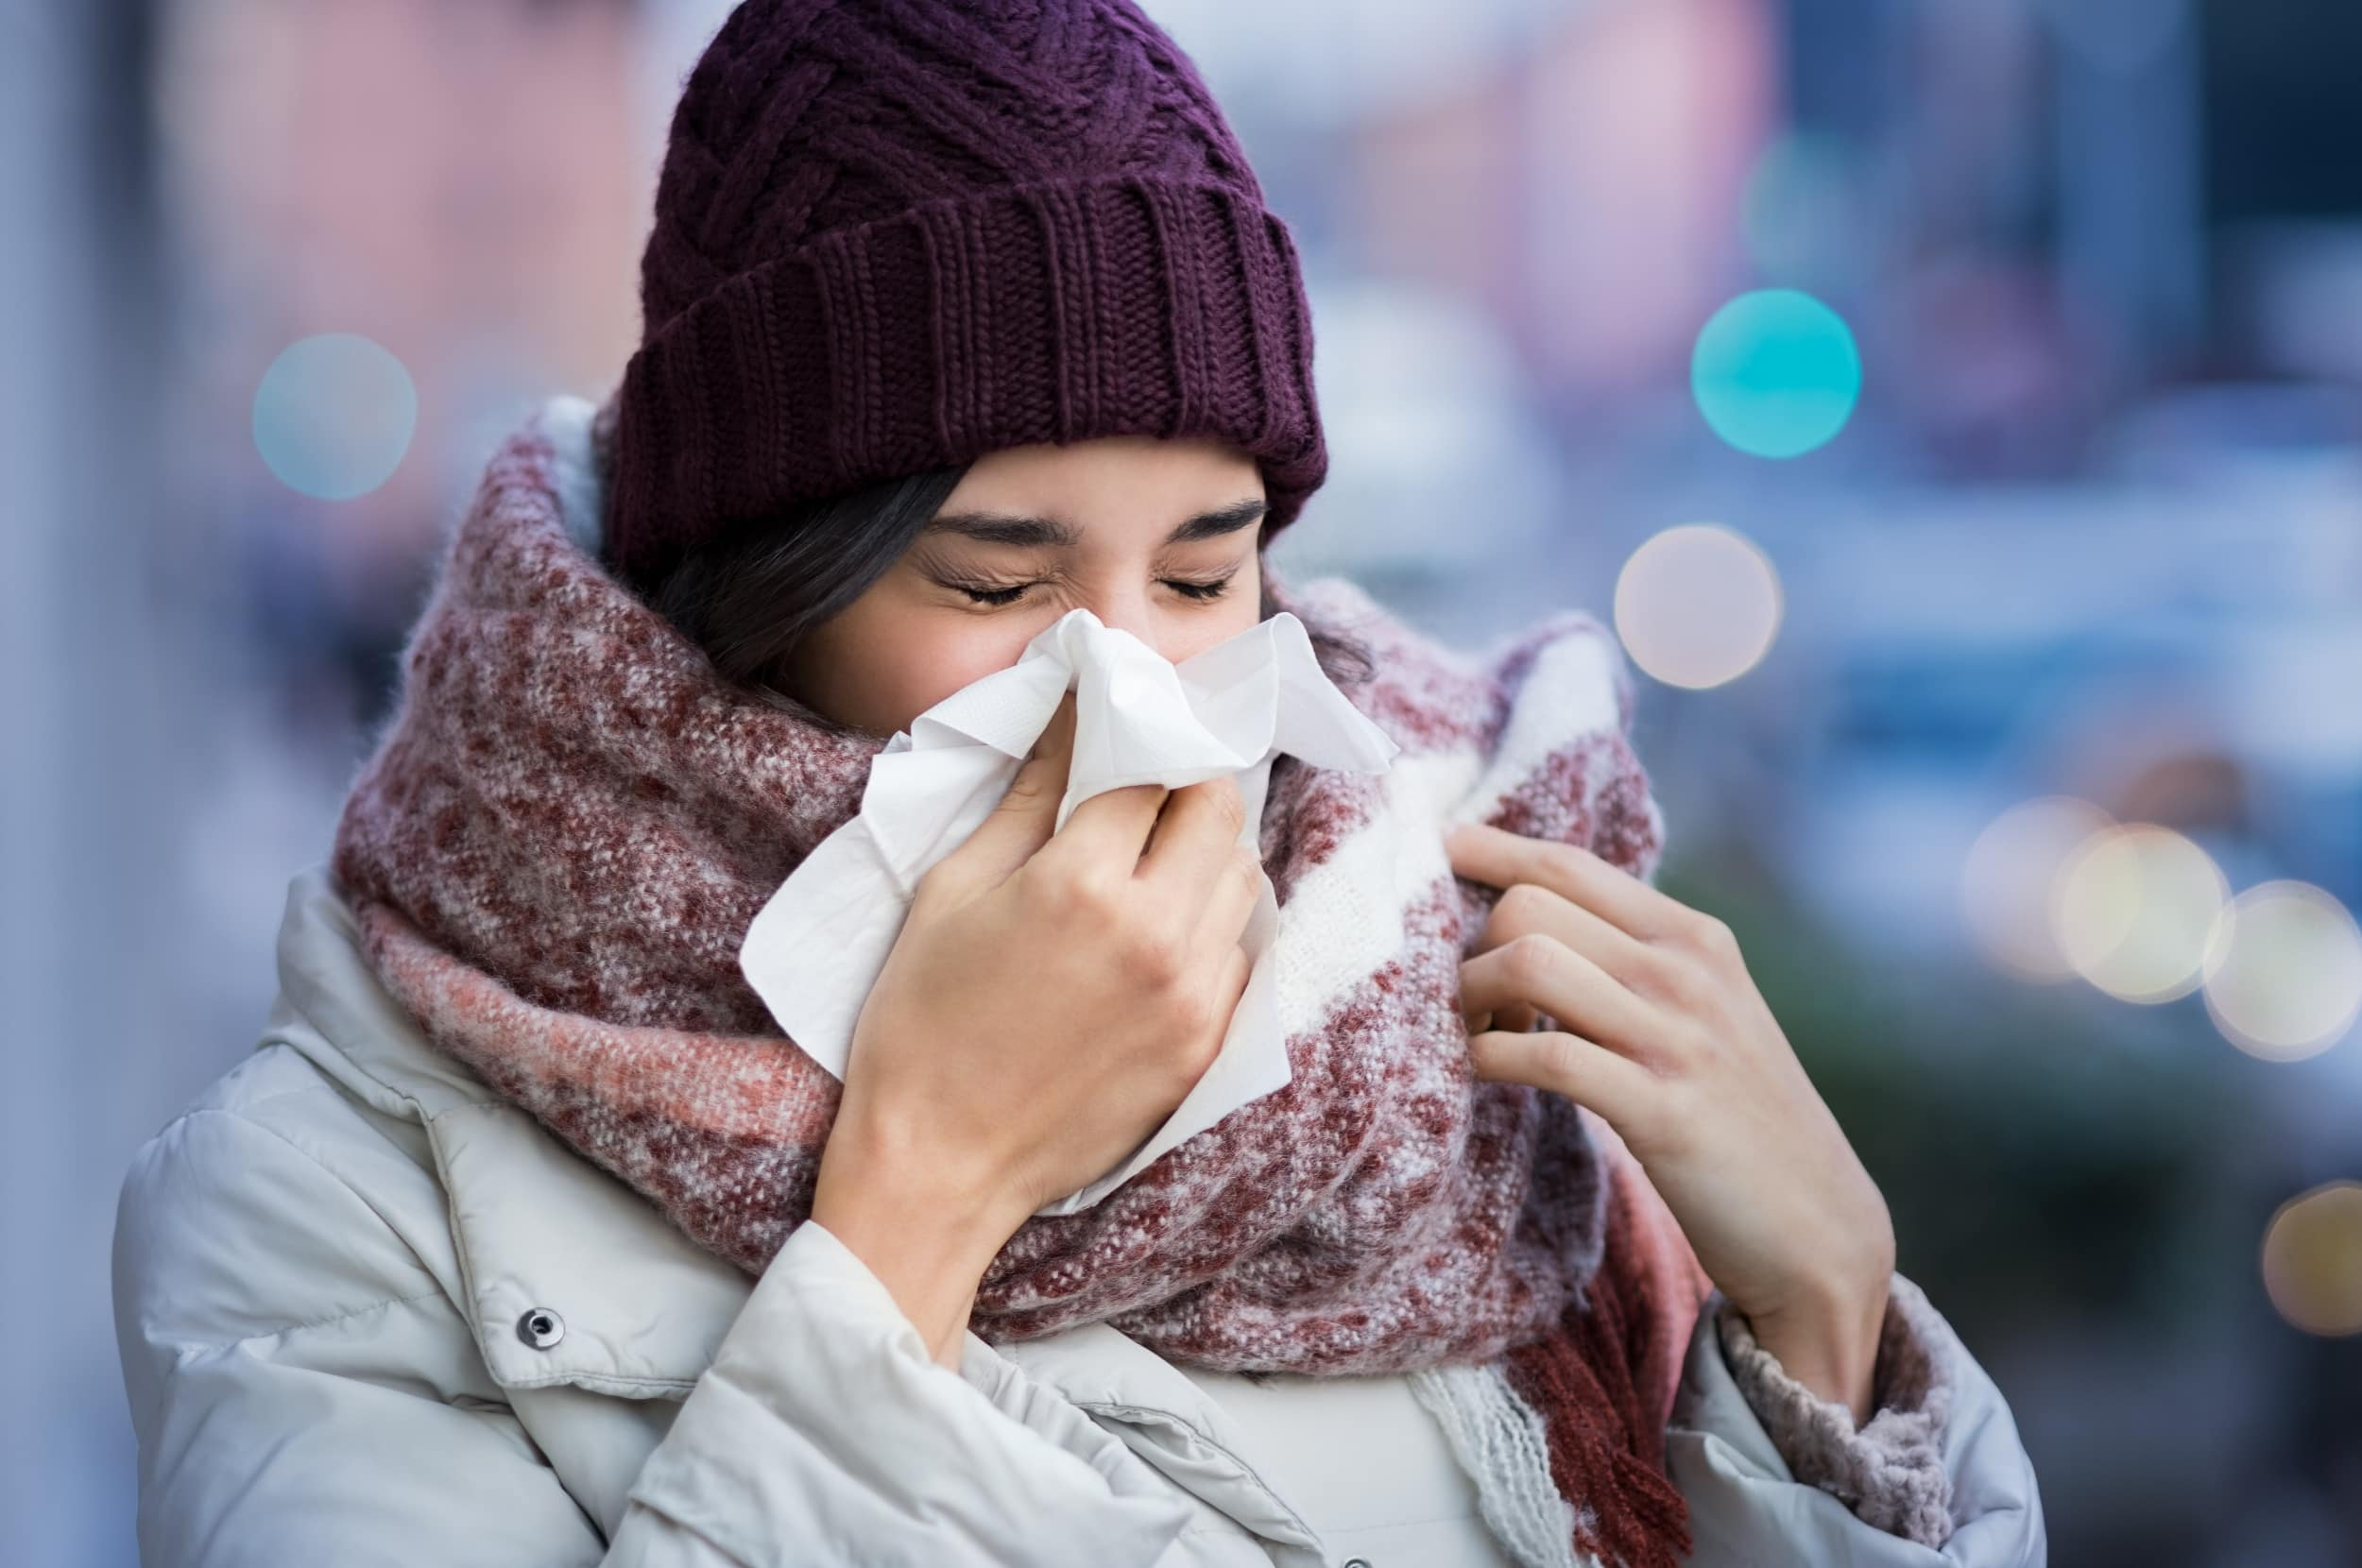 Прививка от гриппа взрослым и детям: за и против